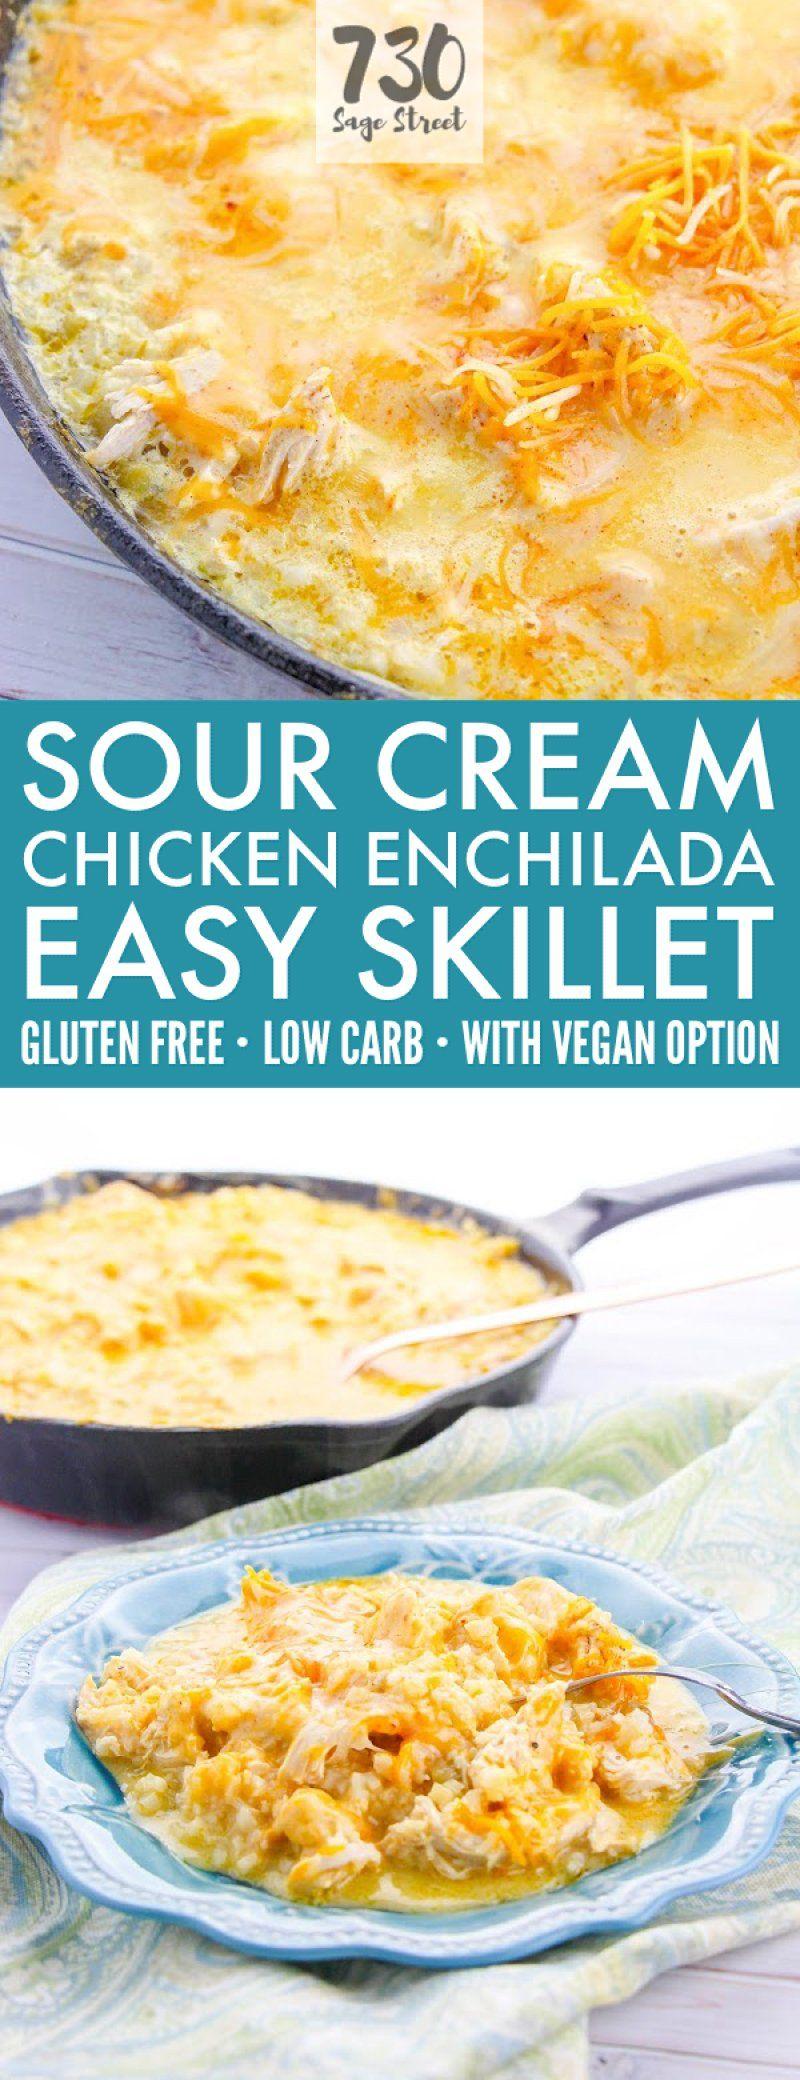 This Cheesy Low Carb Sour Cream Chicken Enchiladas Recipe Is A Delicious Easy Keto Mexican Dinn Sour Cream Chicken Sour Cream Chicken Enchilada Recipe Recipes